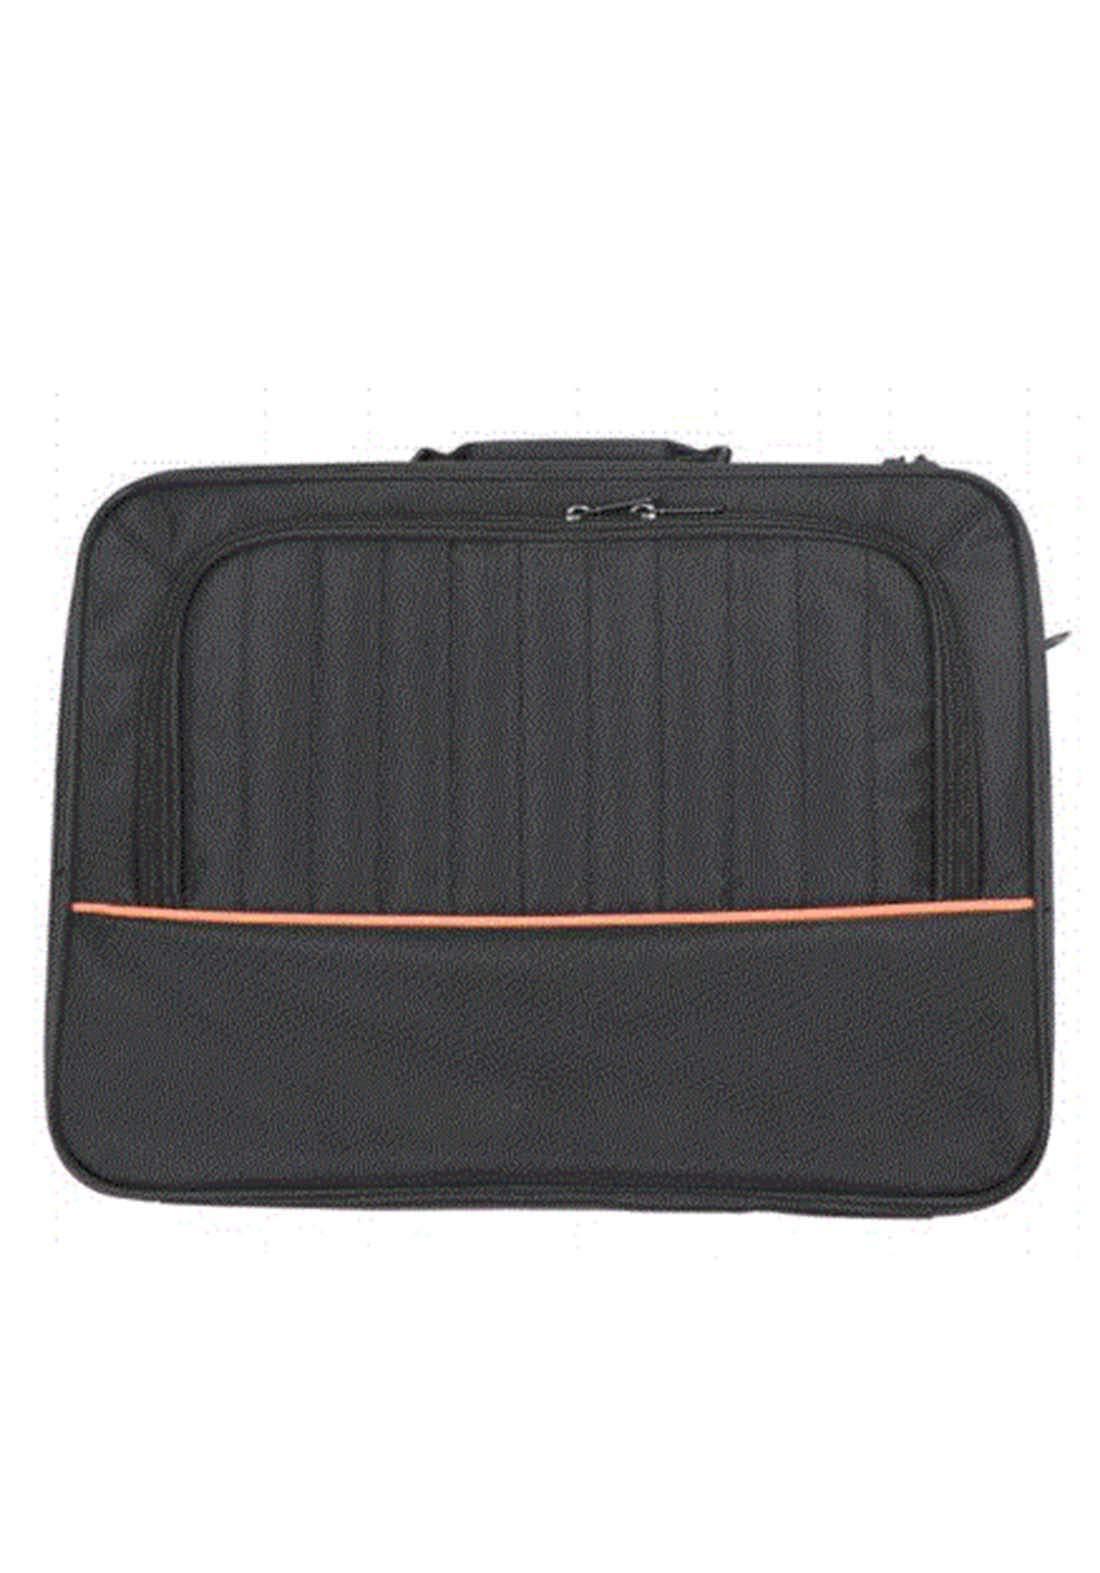 K92 laptop Bag - Black حقيبة لابتوب